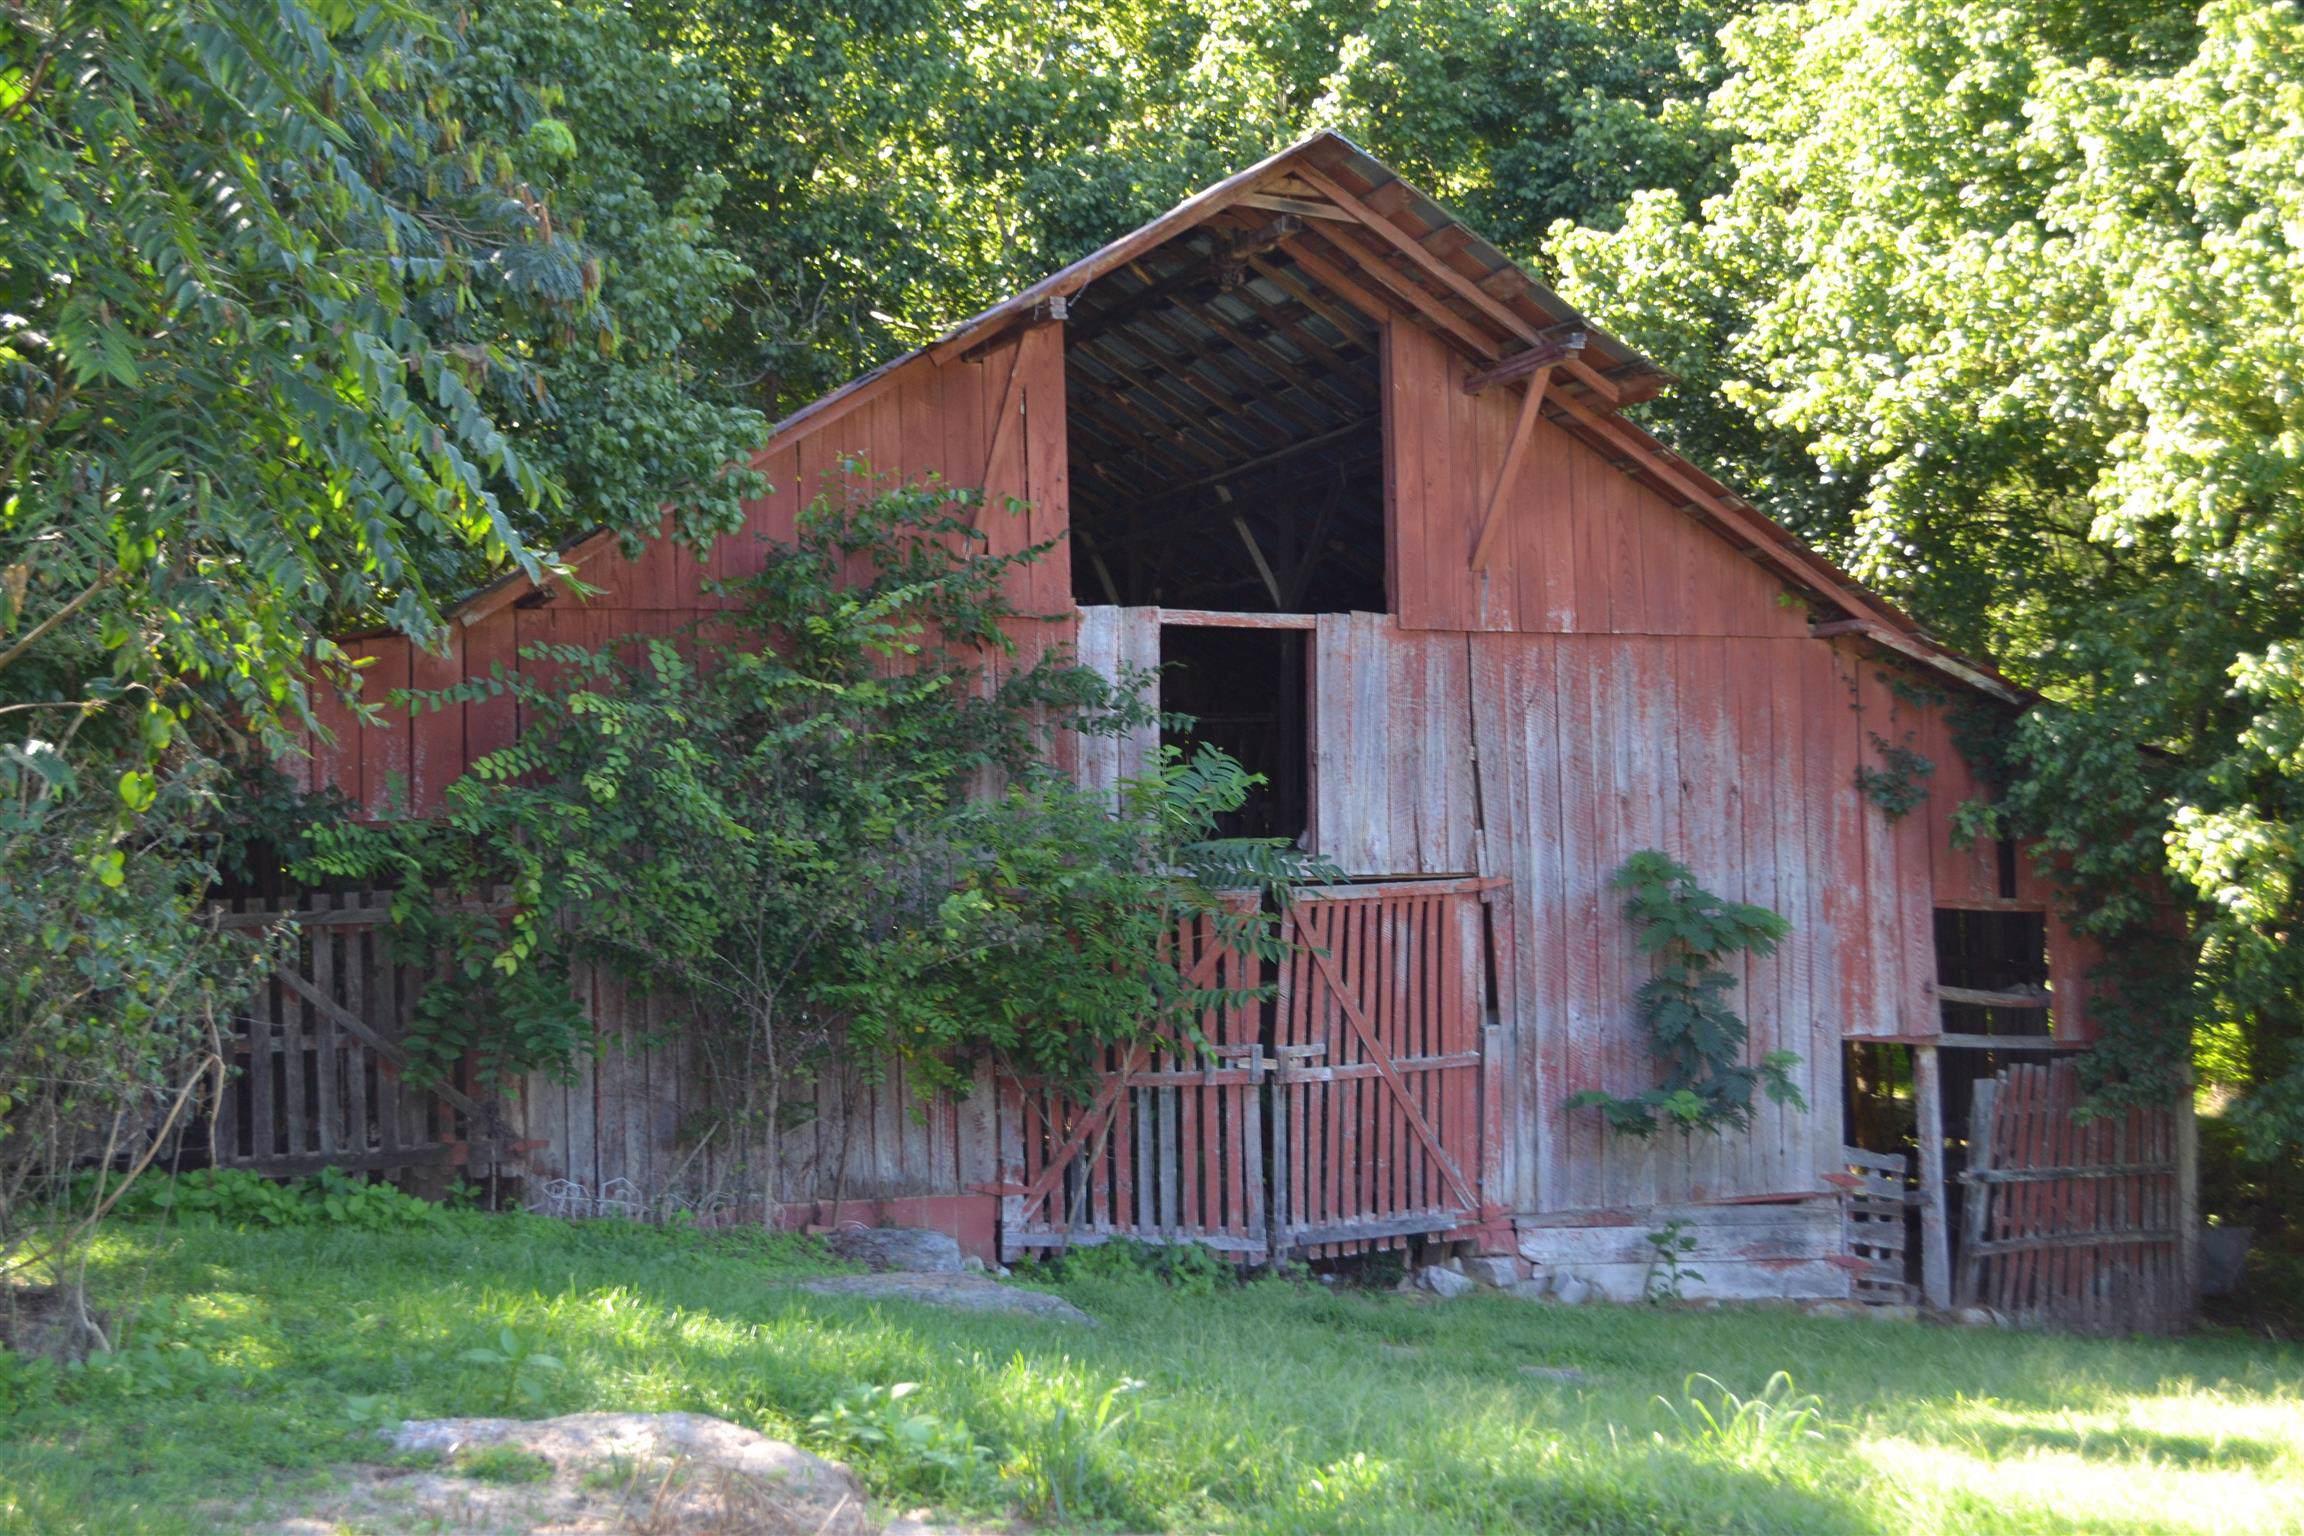 1561 Dry Fork Rd, Gainesboro, TN 38562 (MLS #RTC2073646) :: REMAX Elite